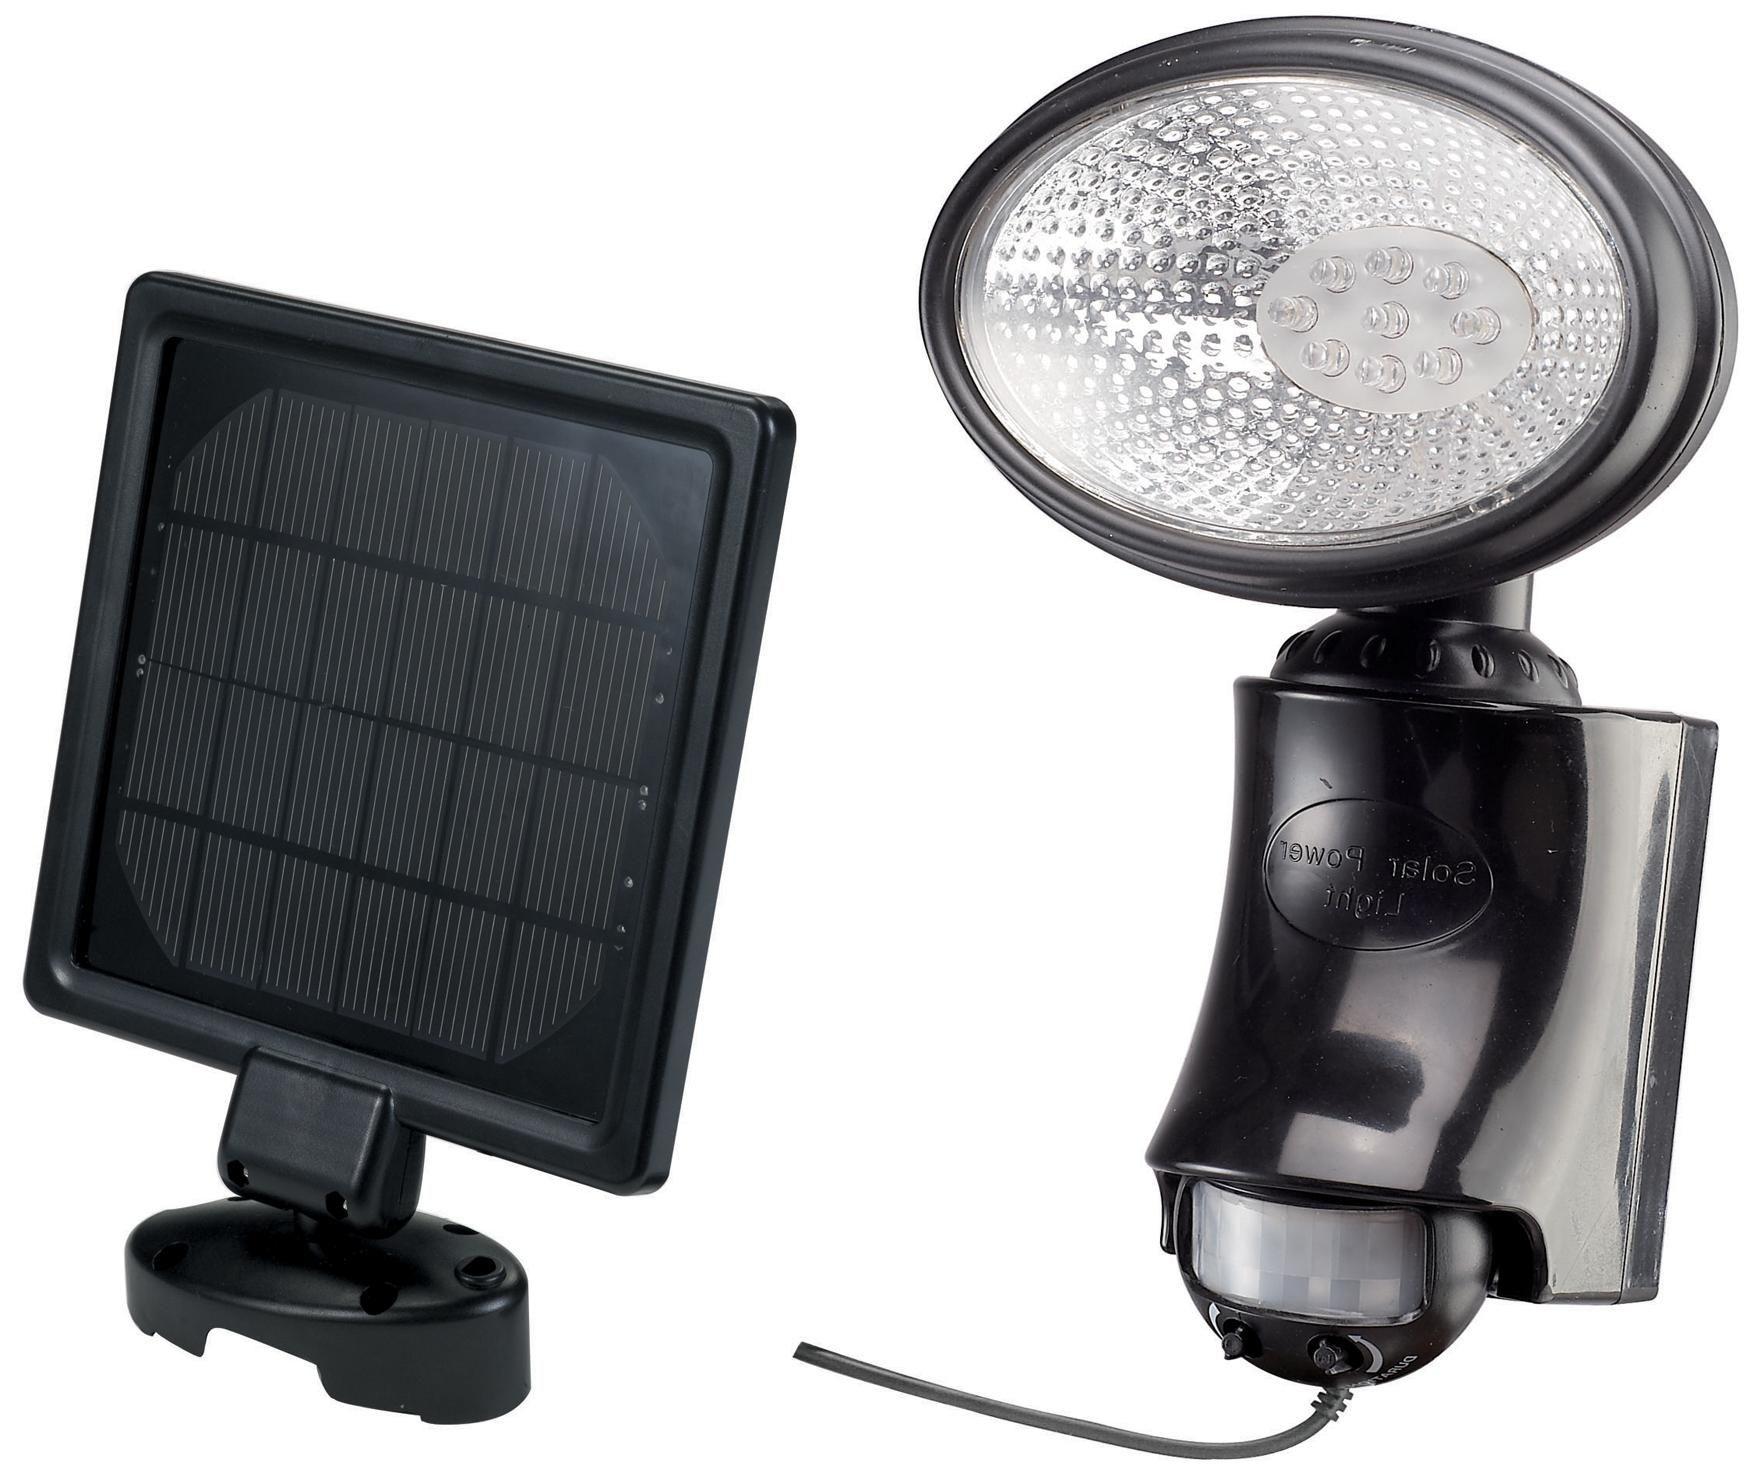 9 Led Solar Motion Sensor Security Light T9761 Lamps Plus Security Lights Solar Landscape Lighting Solar Security Light